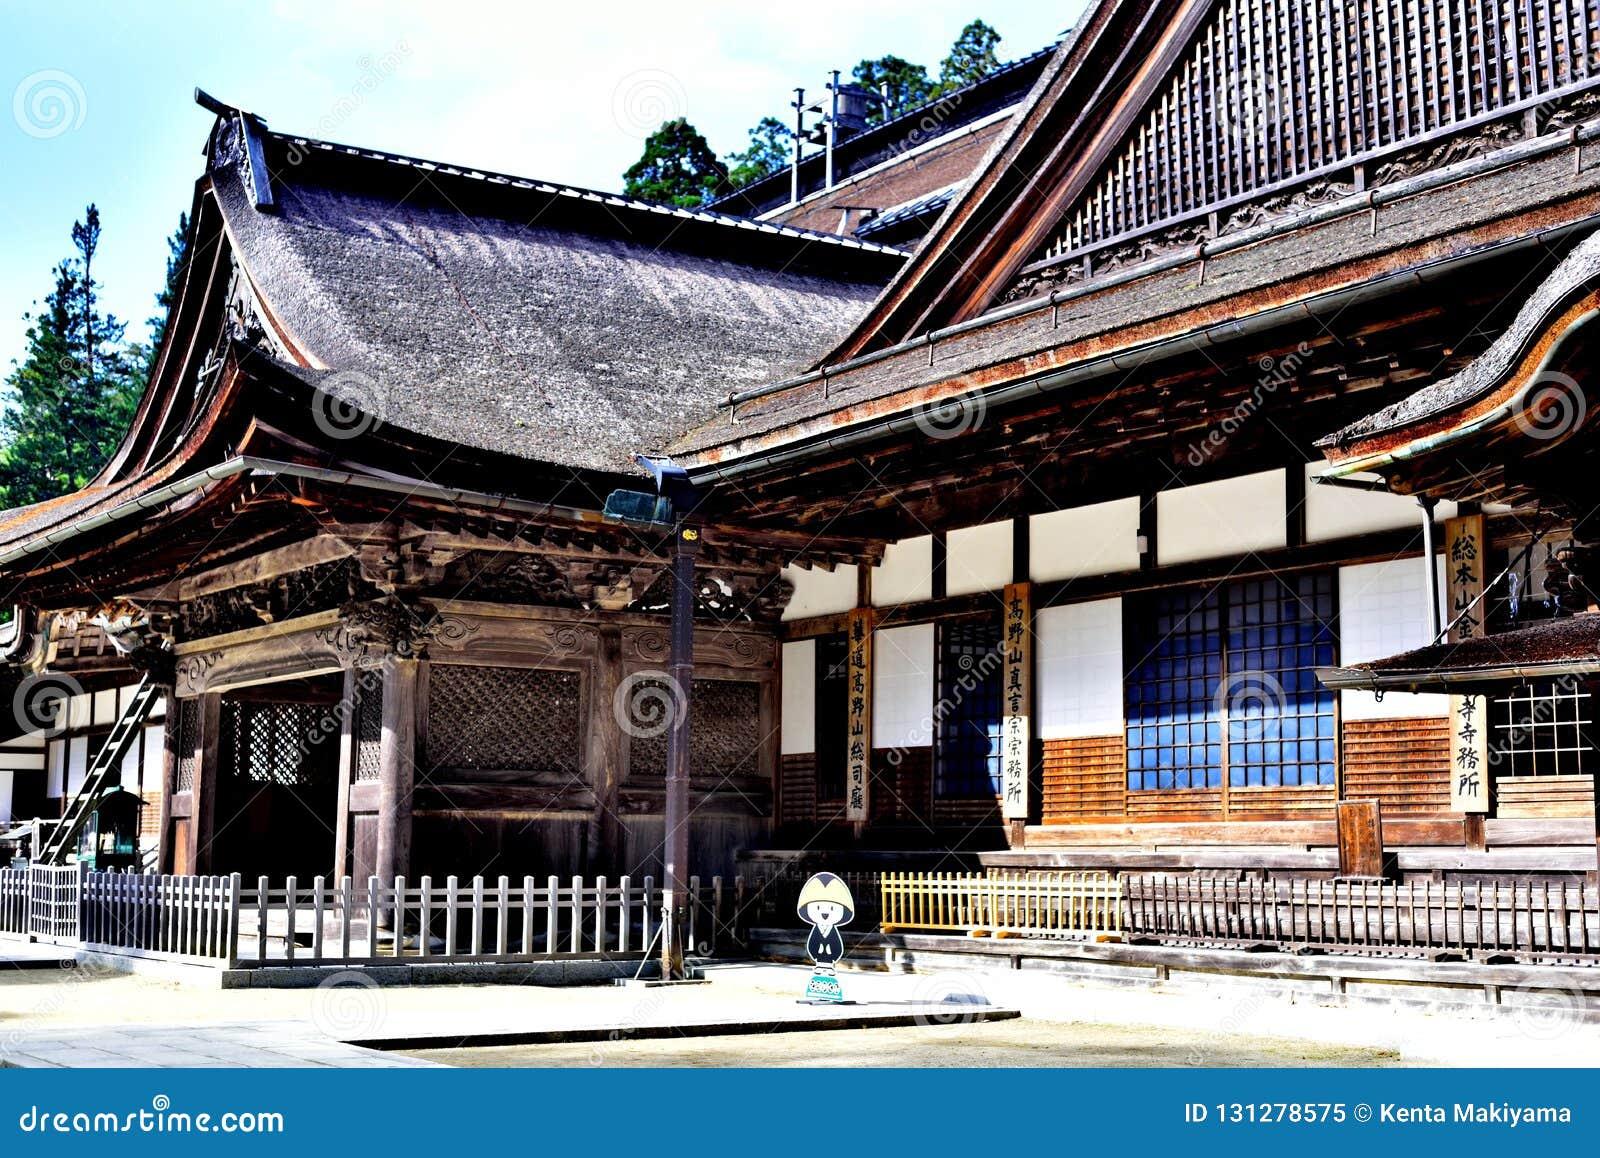 Solemn Architecture, Japanese Buddhism Temple, Koyasan Stock Image